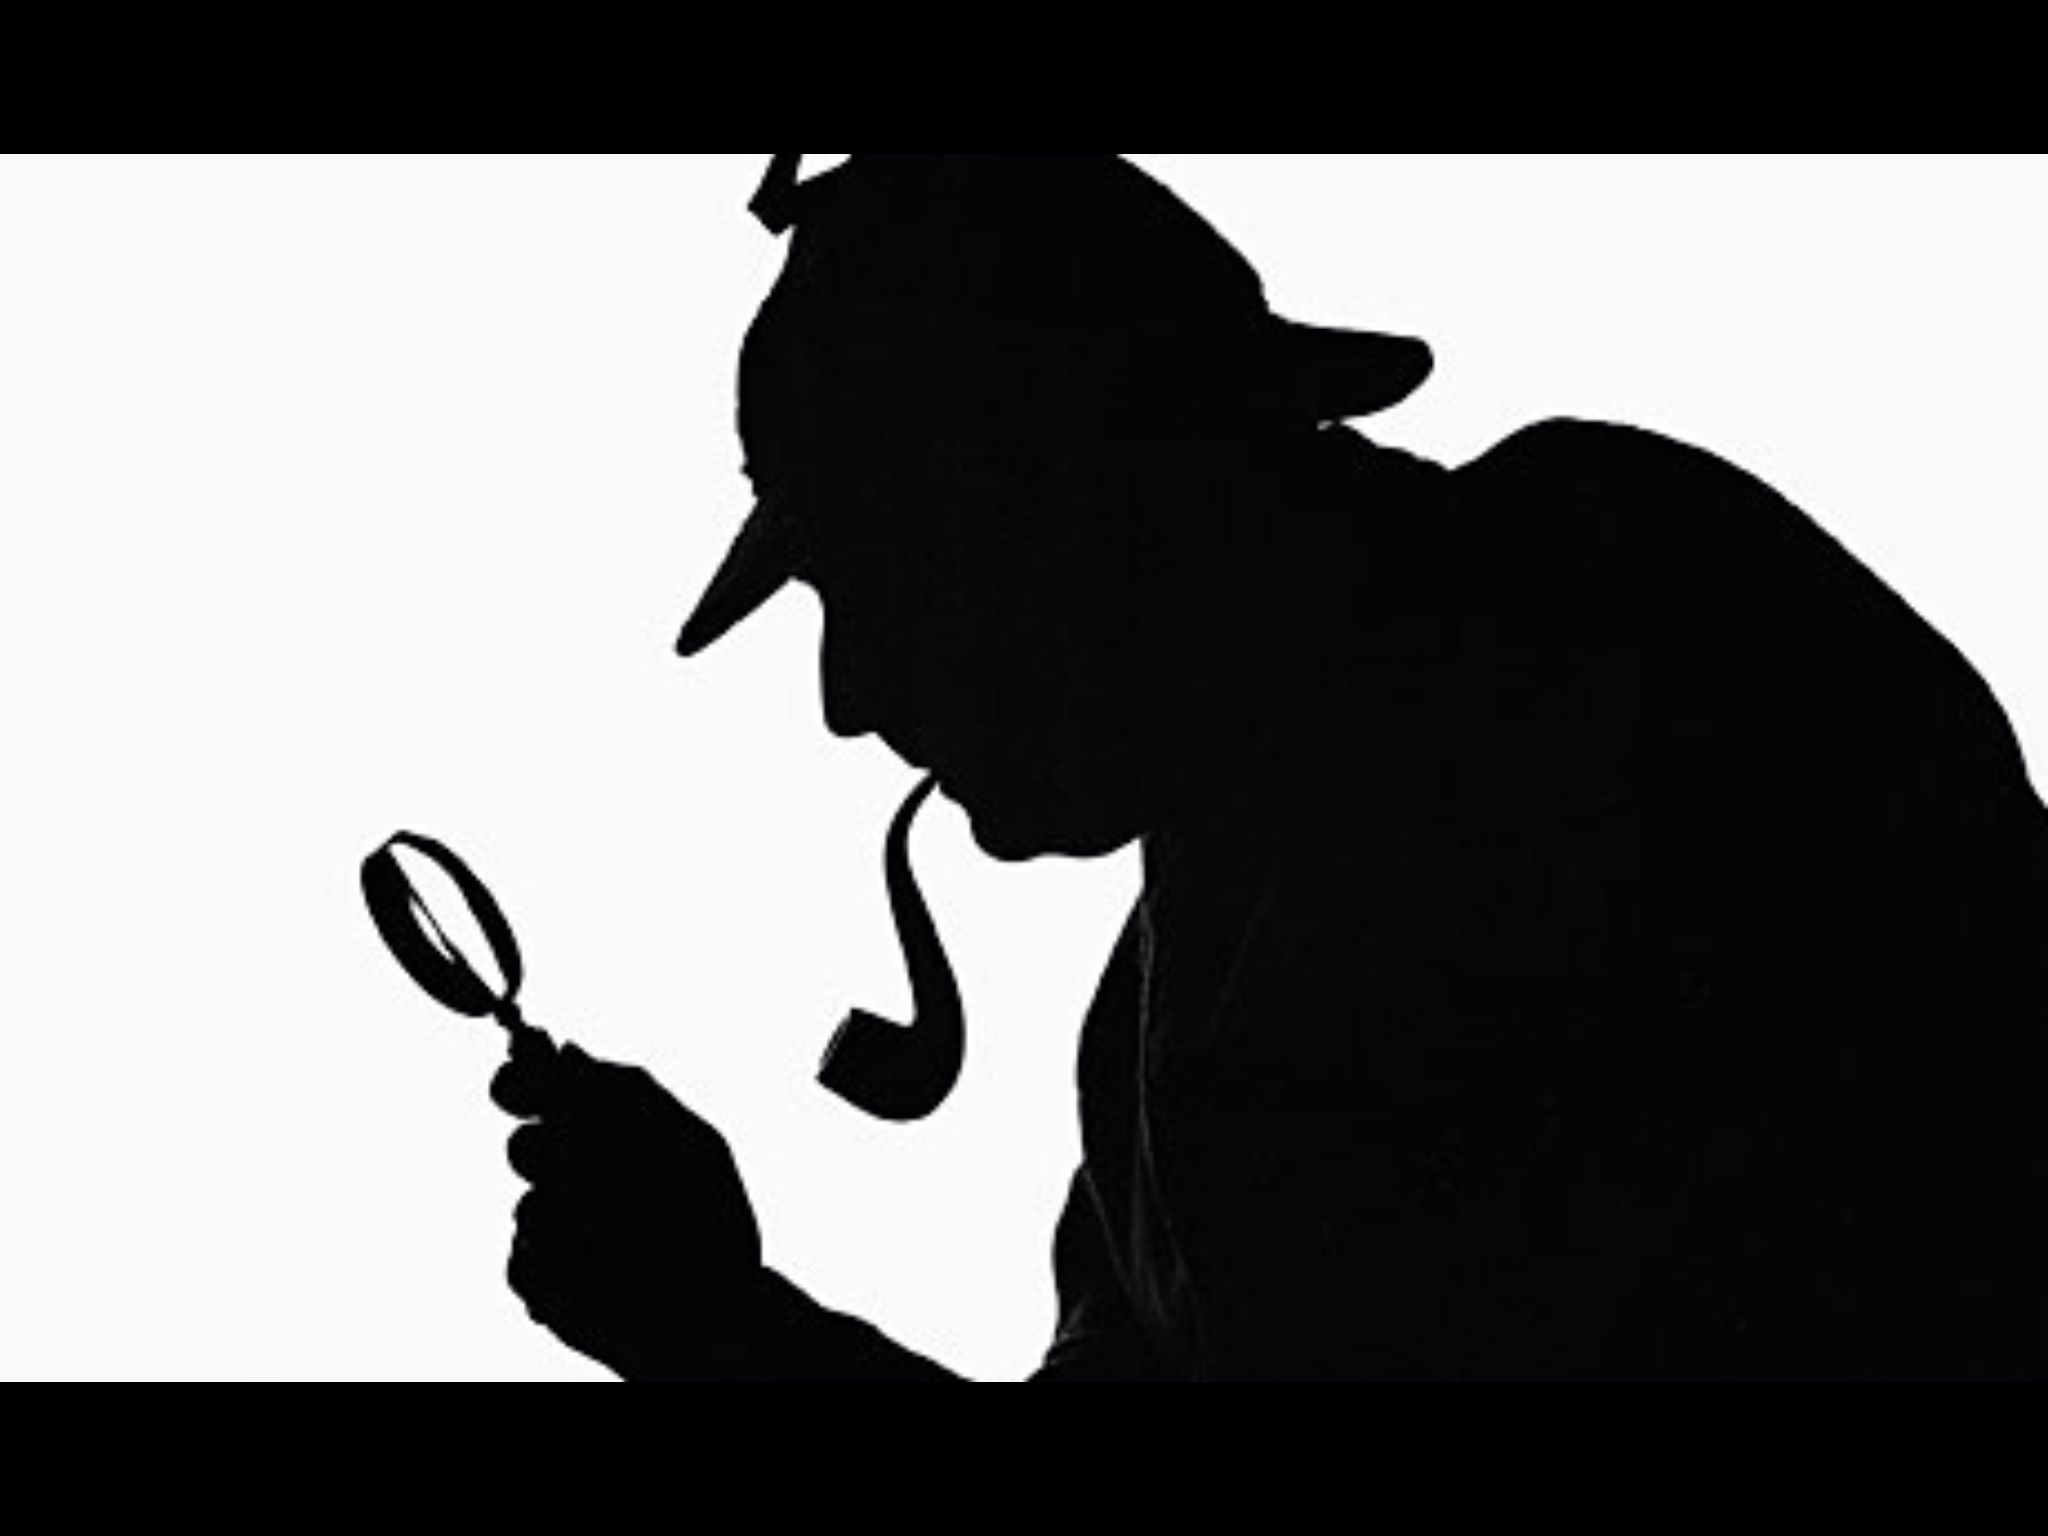 2048x1536 Sherlock Holmes Silhouette Drawing Sherlock Holmes